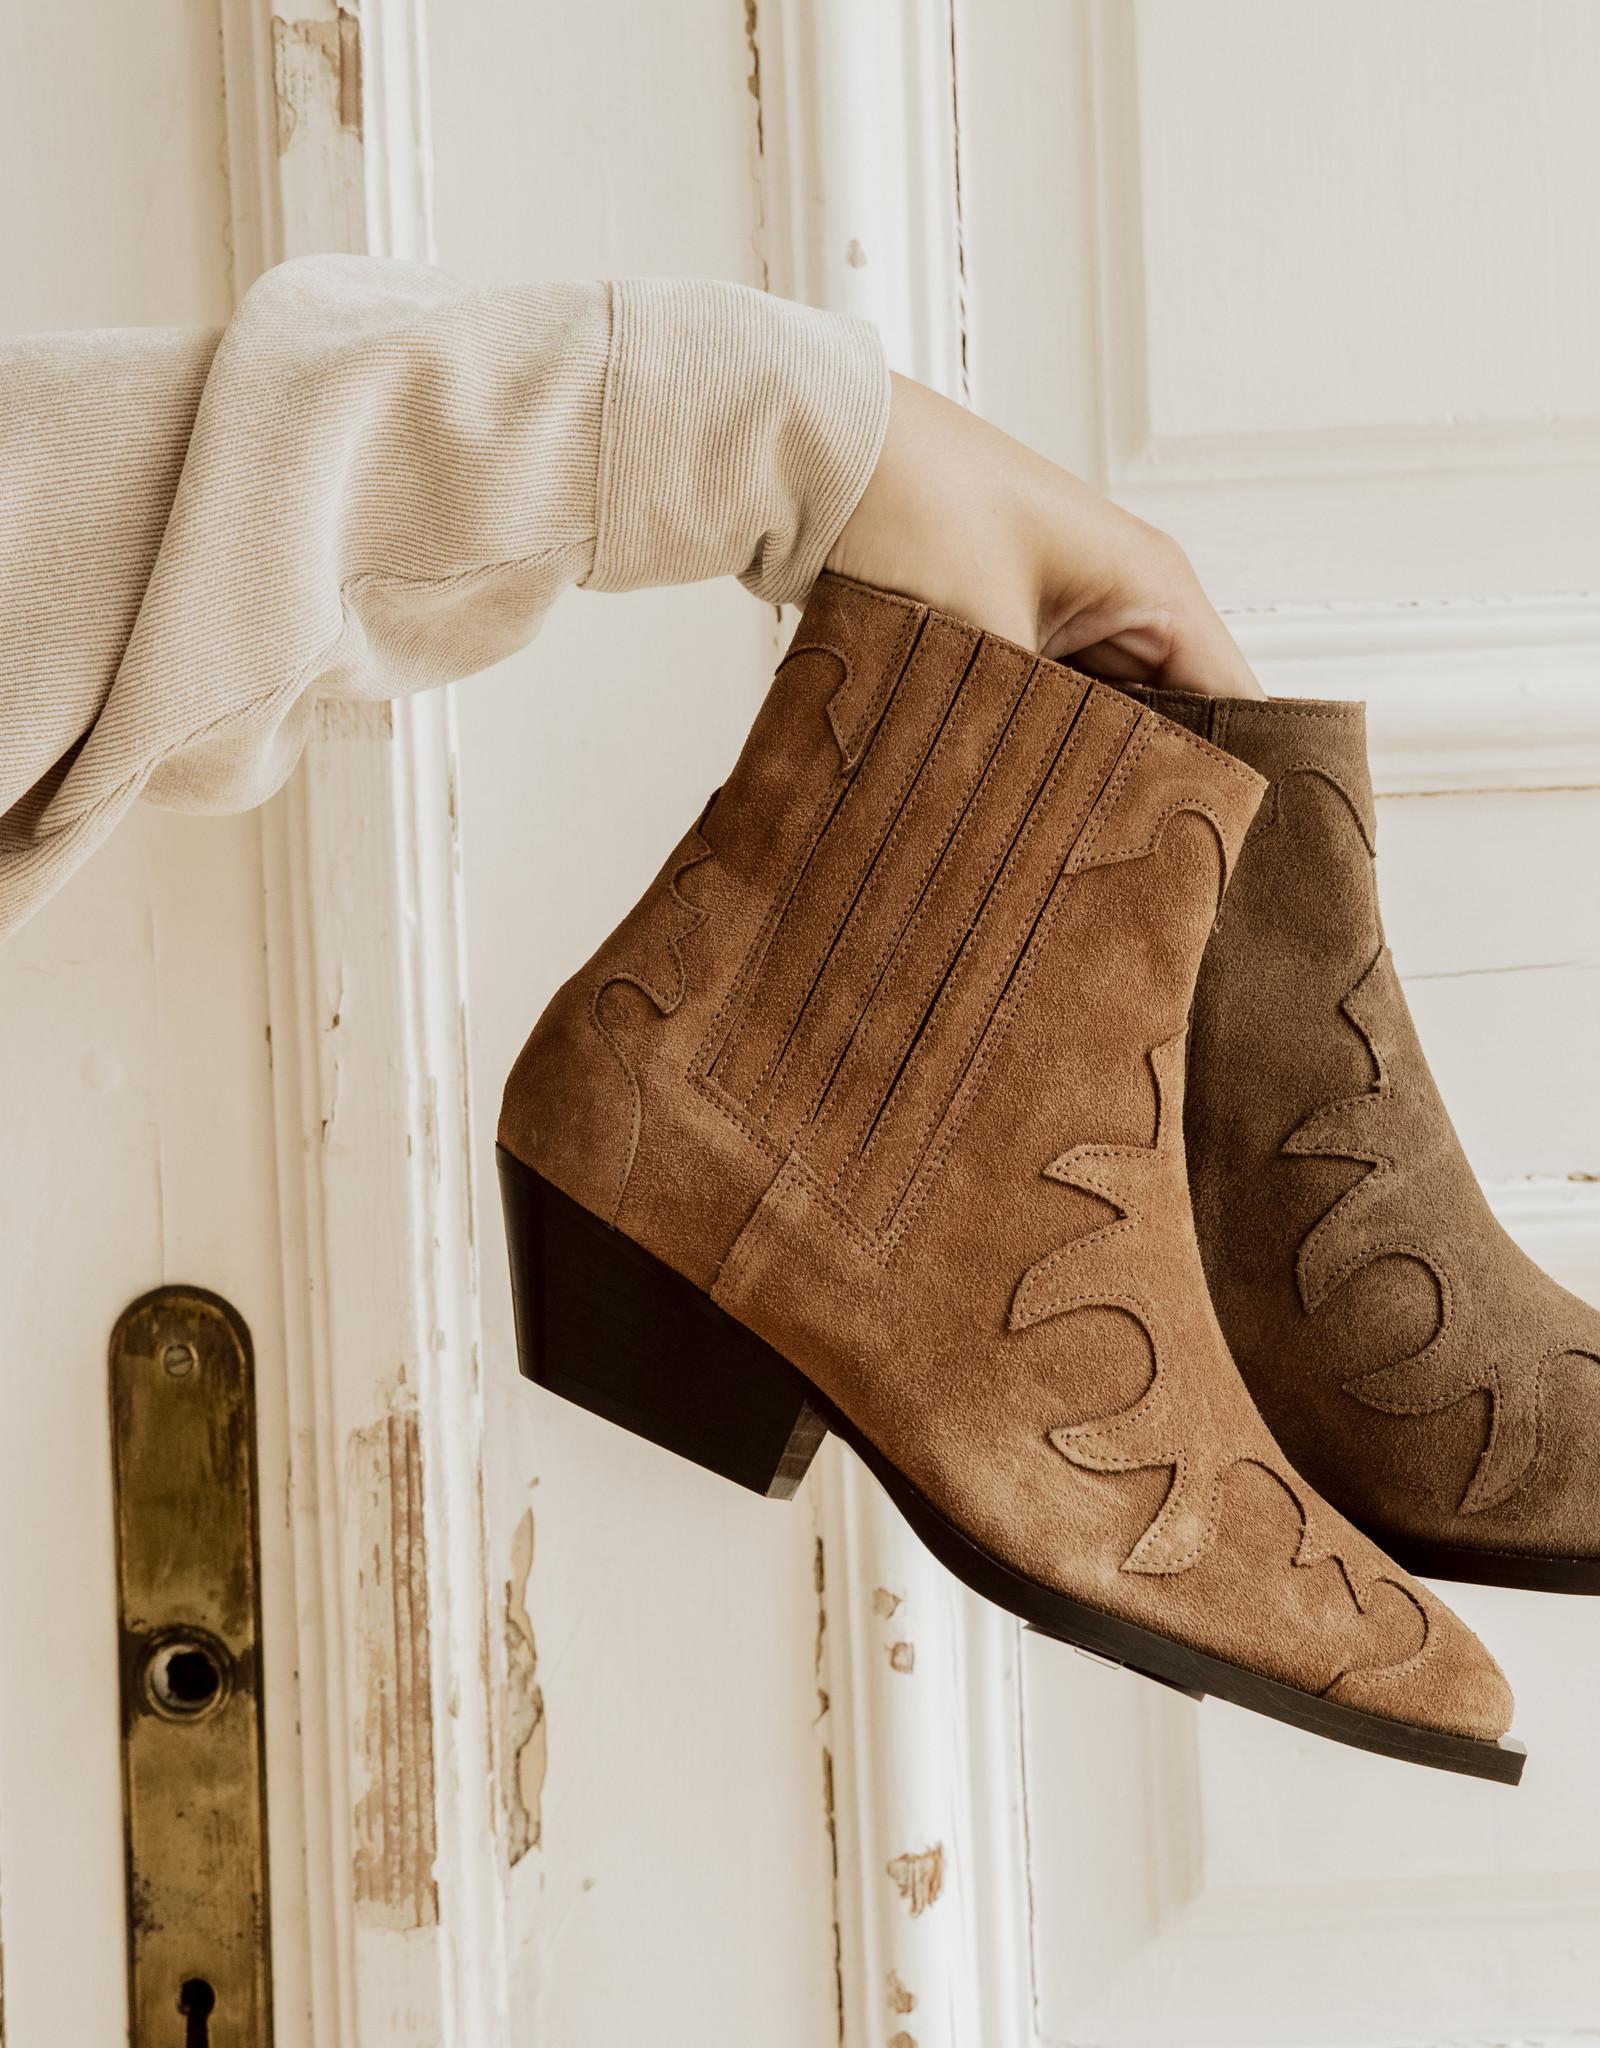 Tango Shoes Enkellaarsjes  by Tango Shoes - taupe